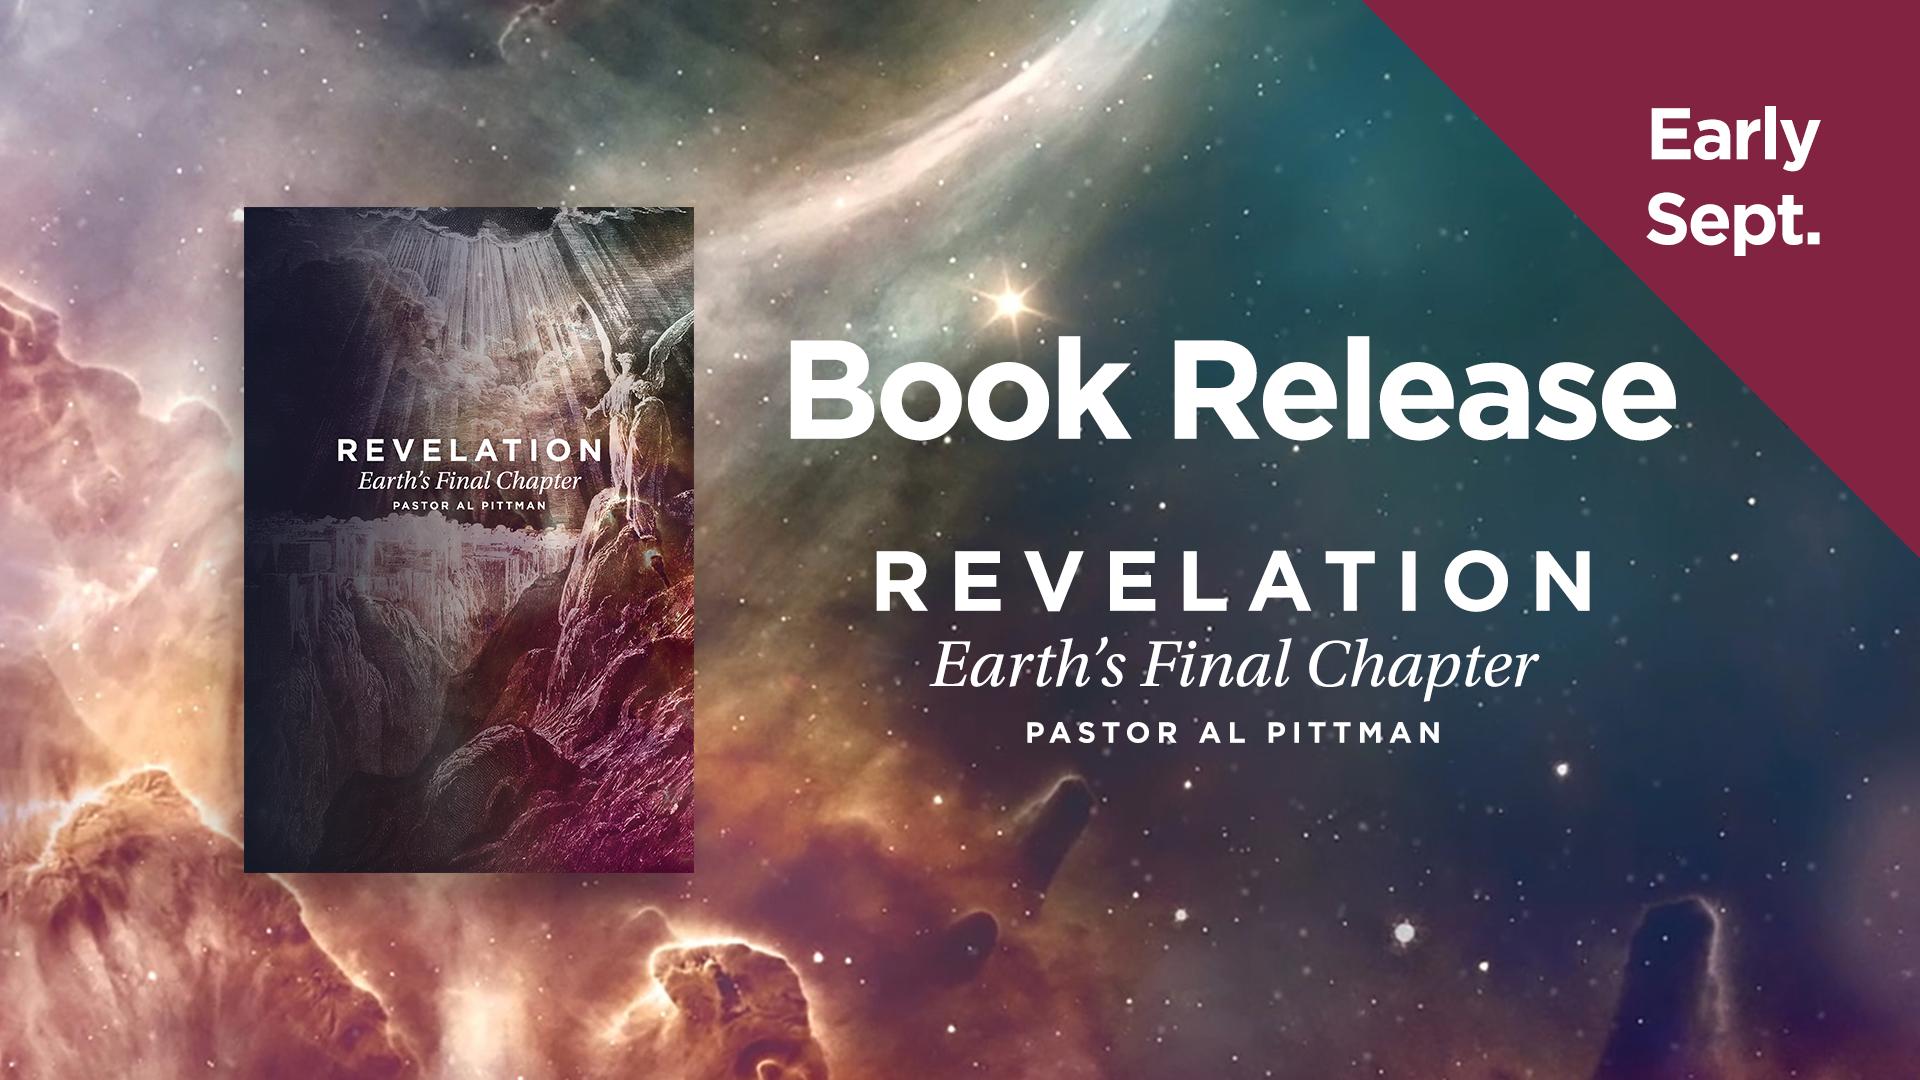 Revelation: Earth's Final Chapter